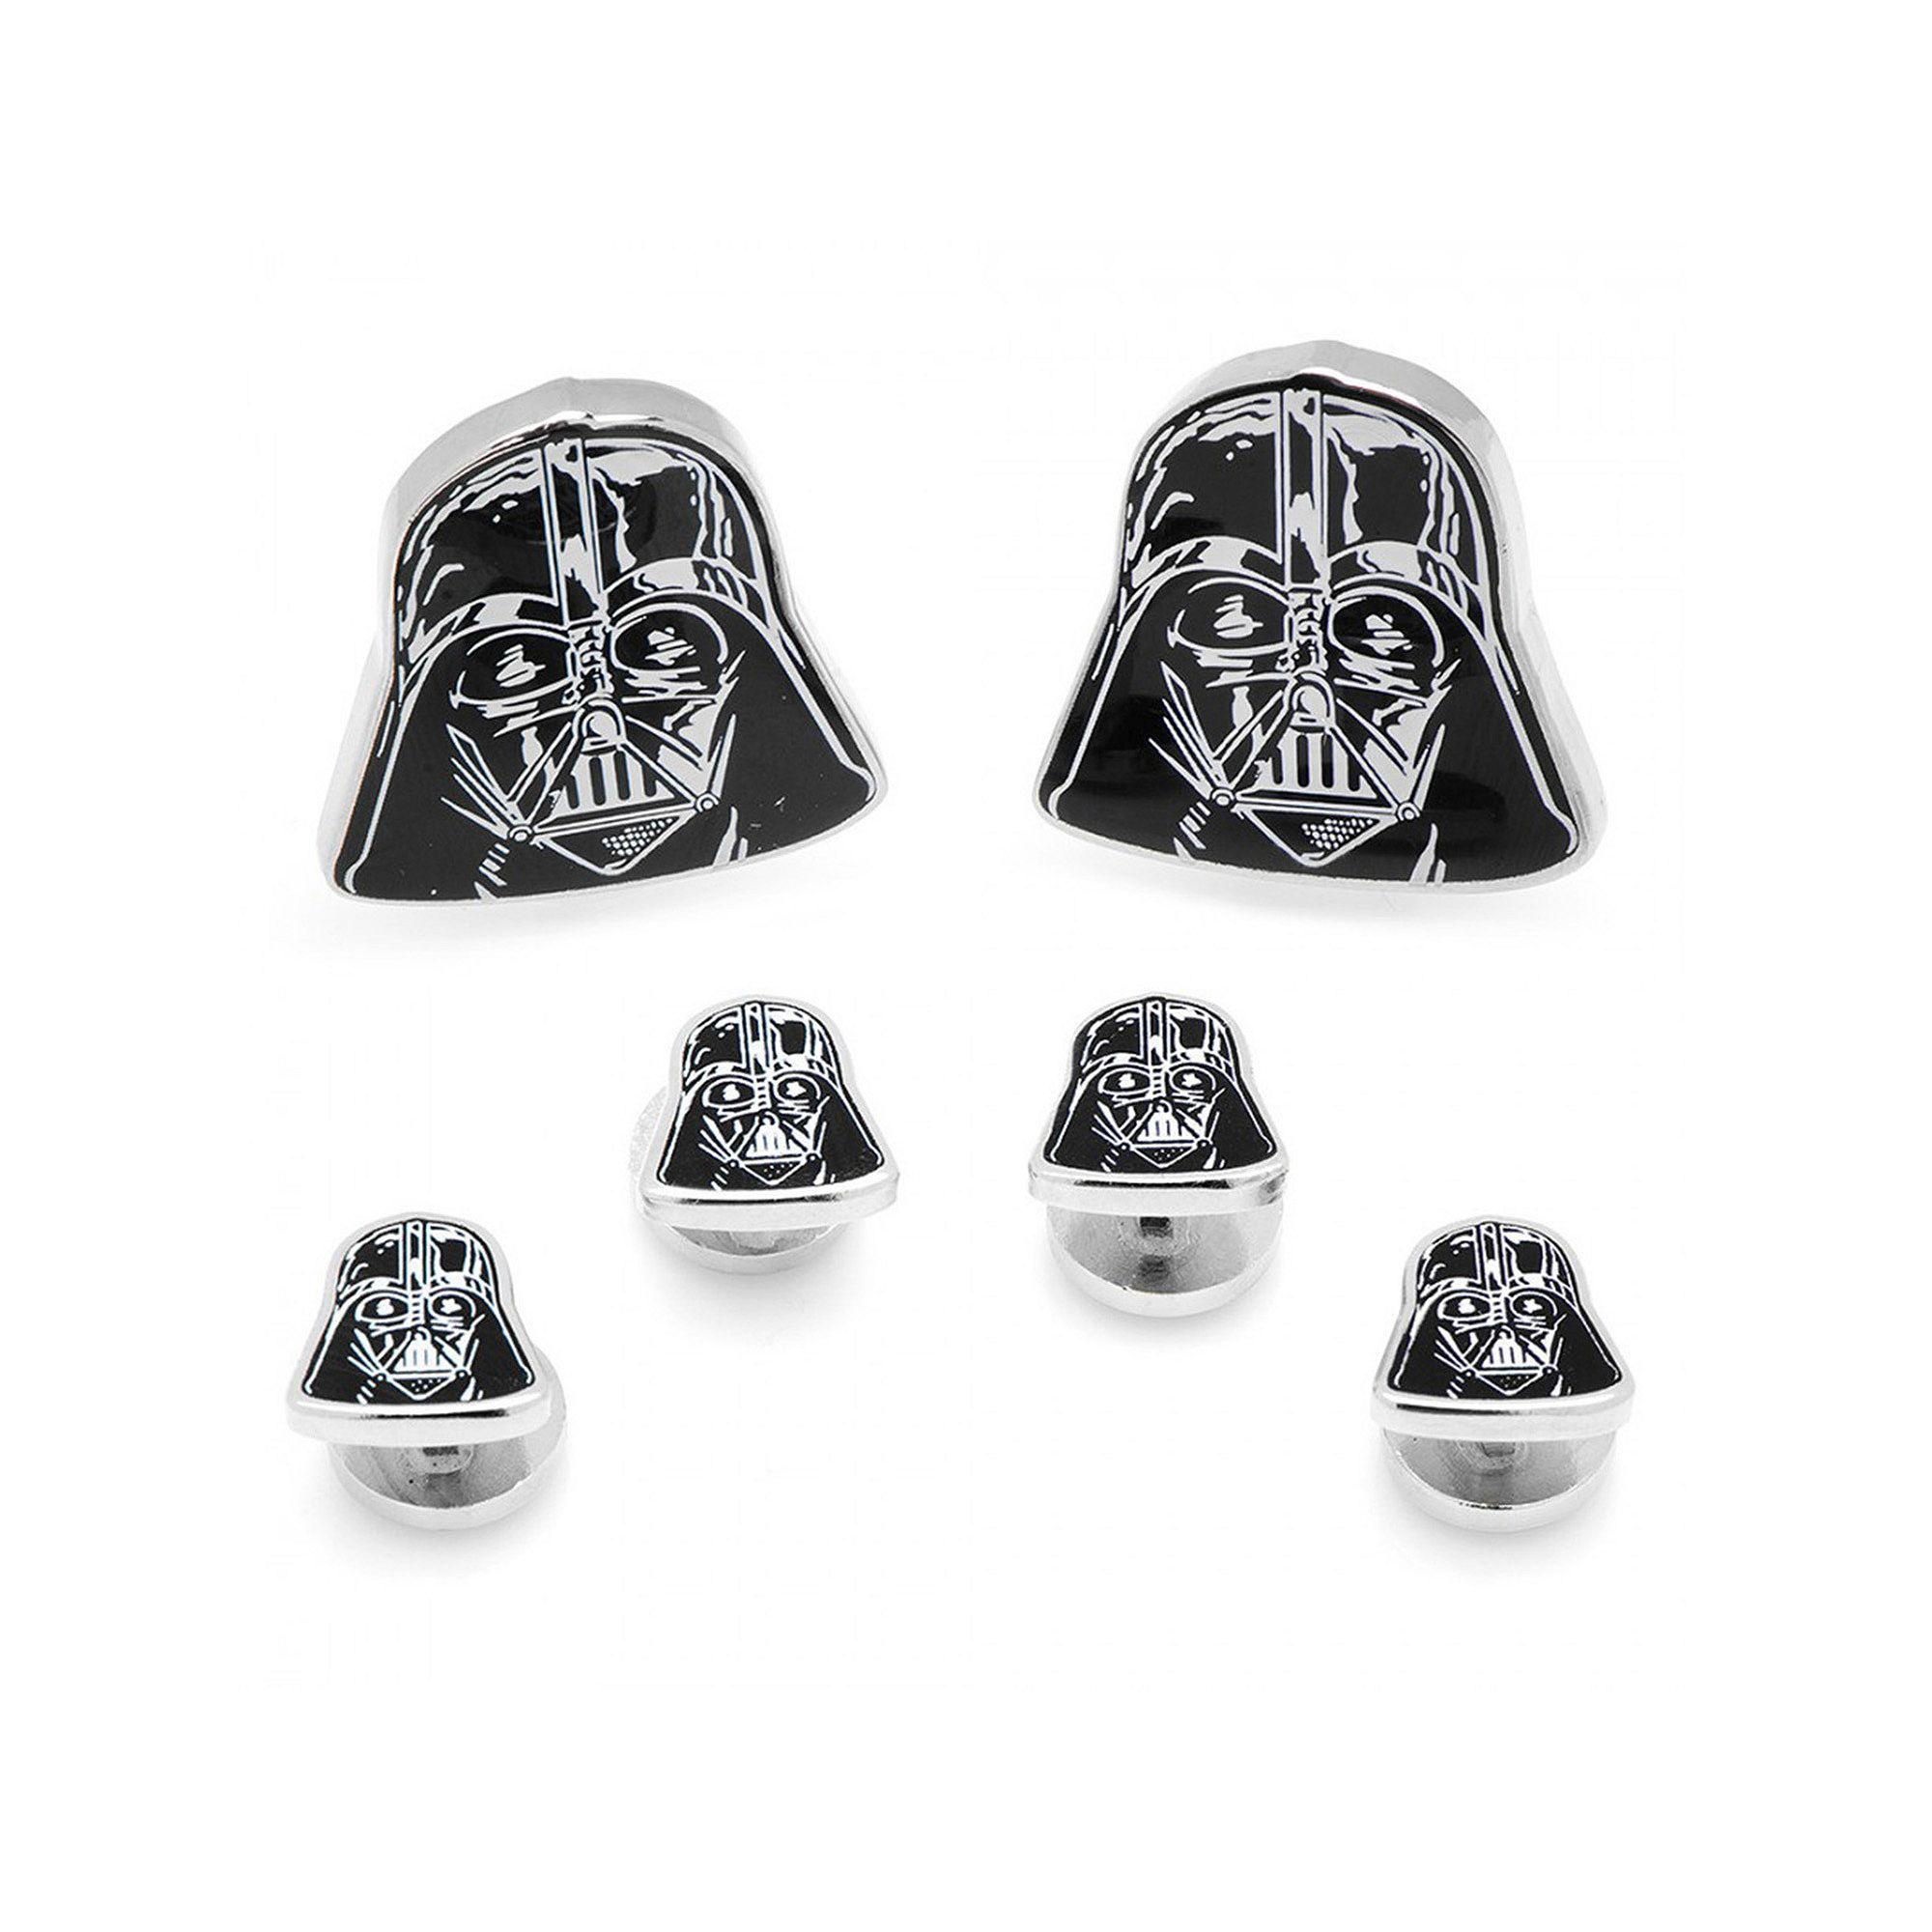 Star Wars Darth Vader Stud & Cuff Links Gift Sets